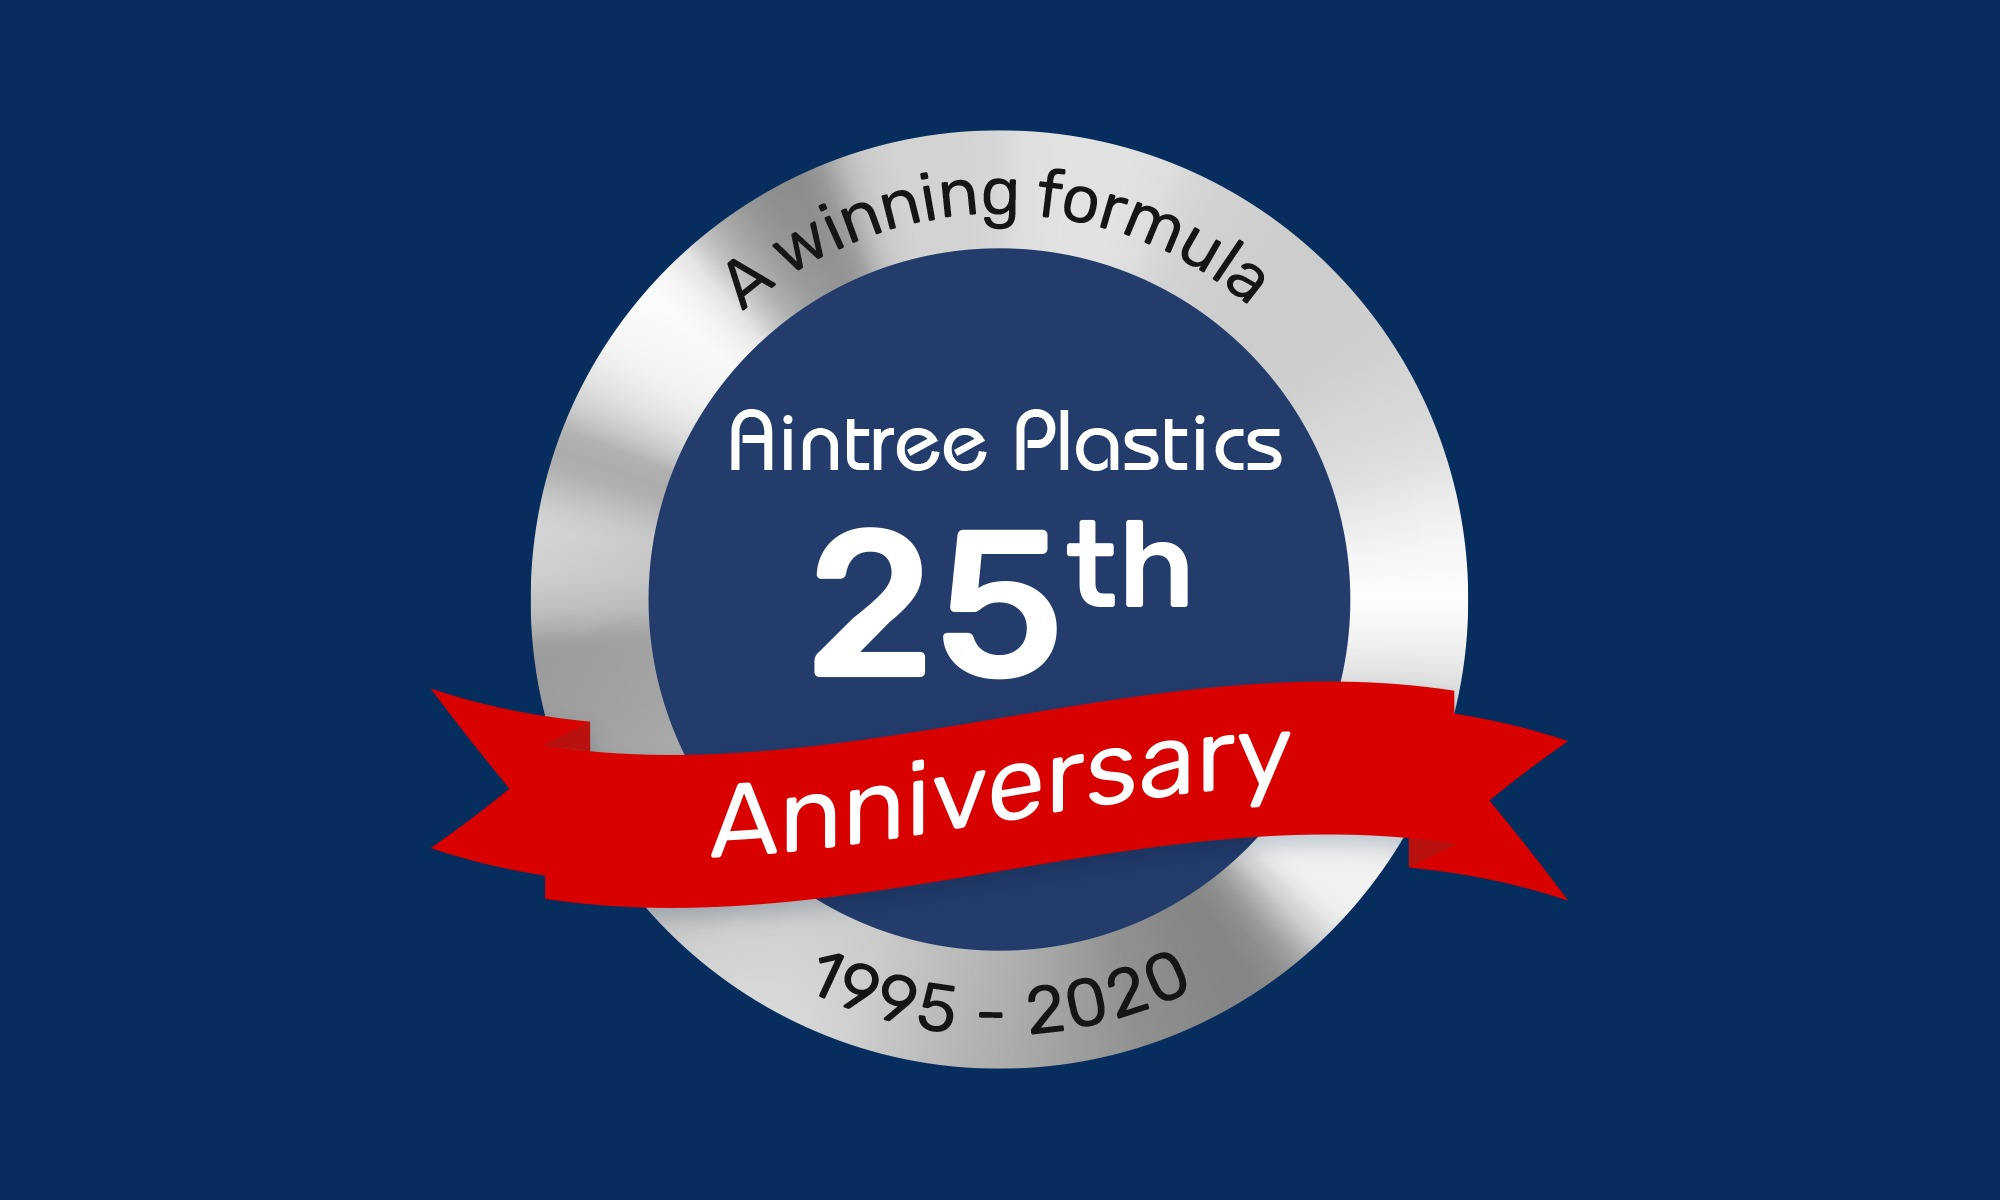 25th-anniversary-logo-blue-bg.jpg#asset:242